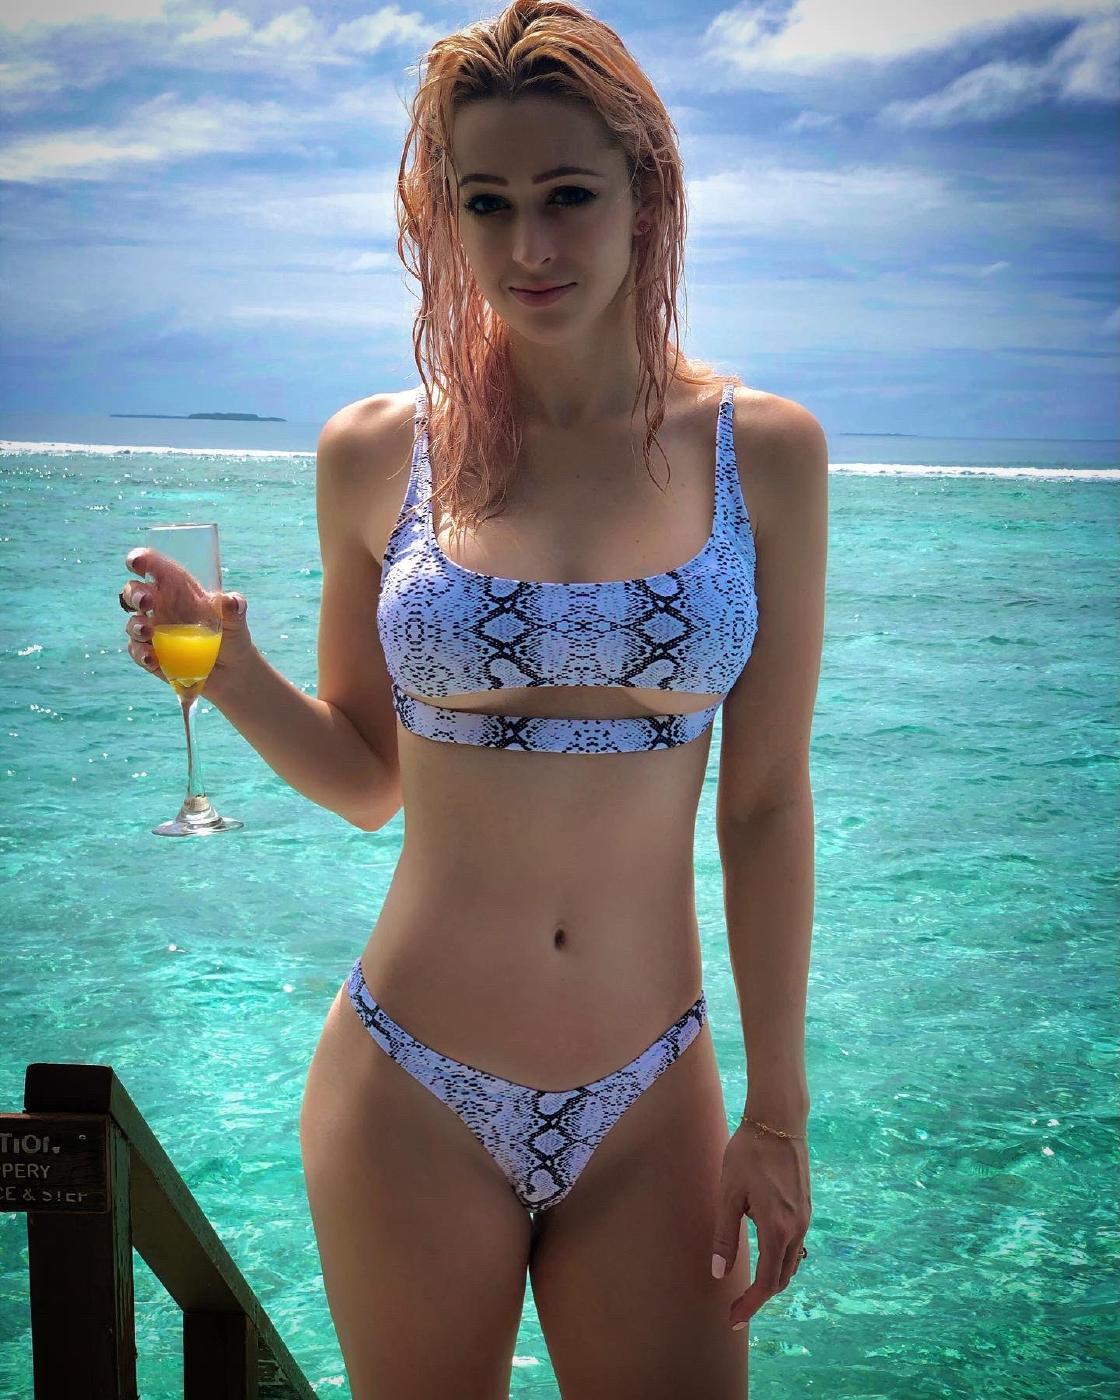 Jaclyn Glenn Nude Bikini Onlyfans Set Leaked Lnlrgh